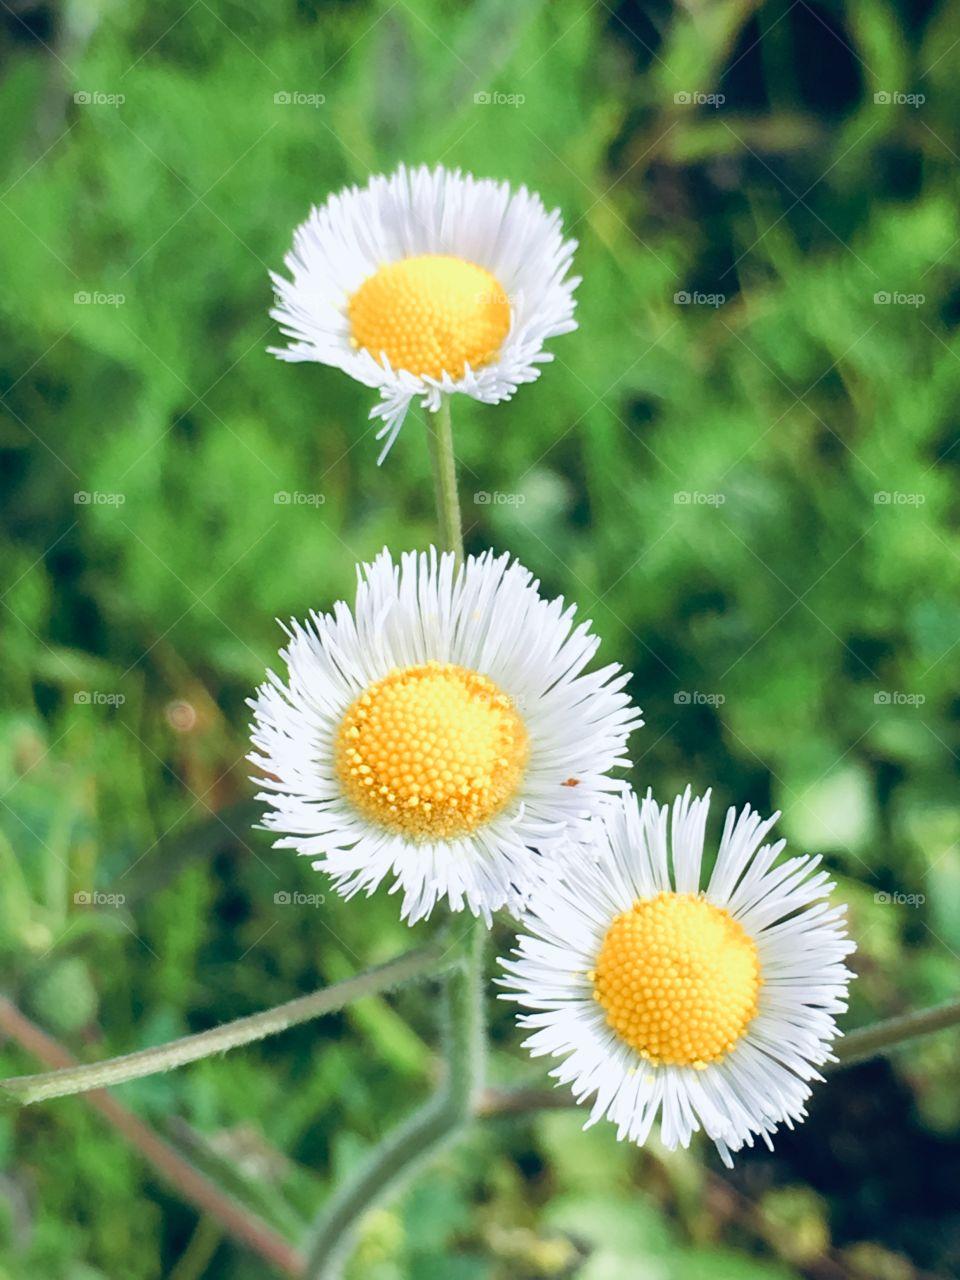 Little white daisy looking flowers